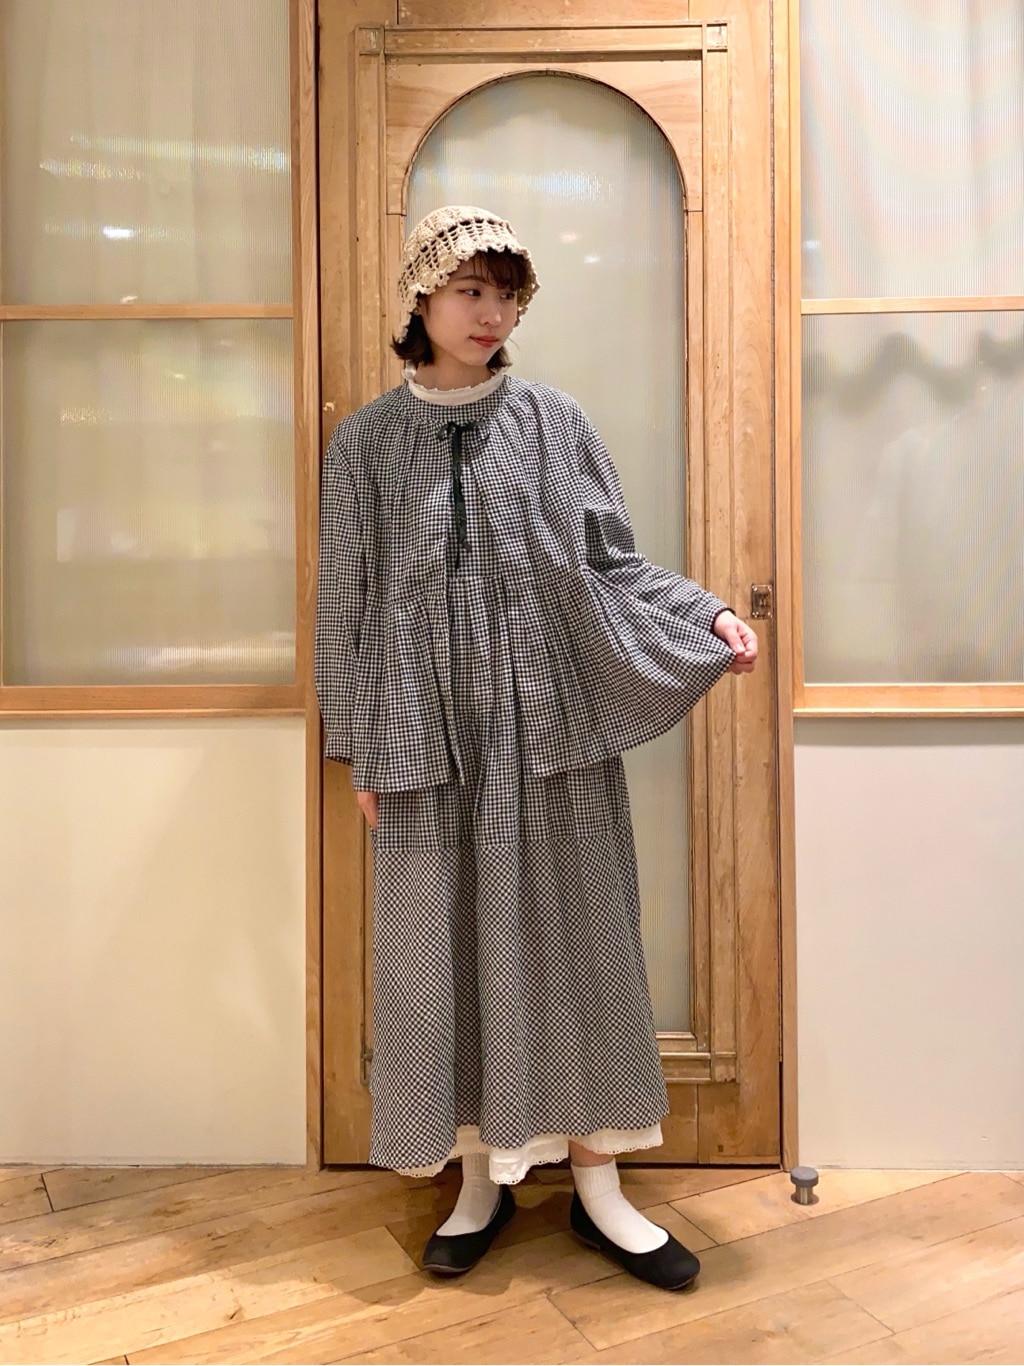 bulle de savon 新宿ミロード 身長:157cm 2021.04.06